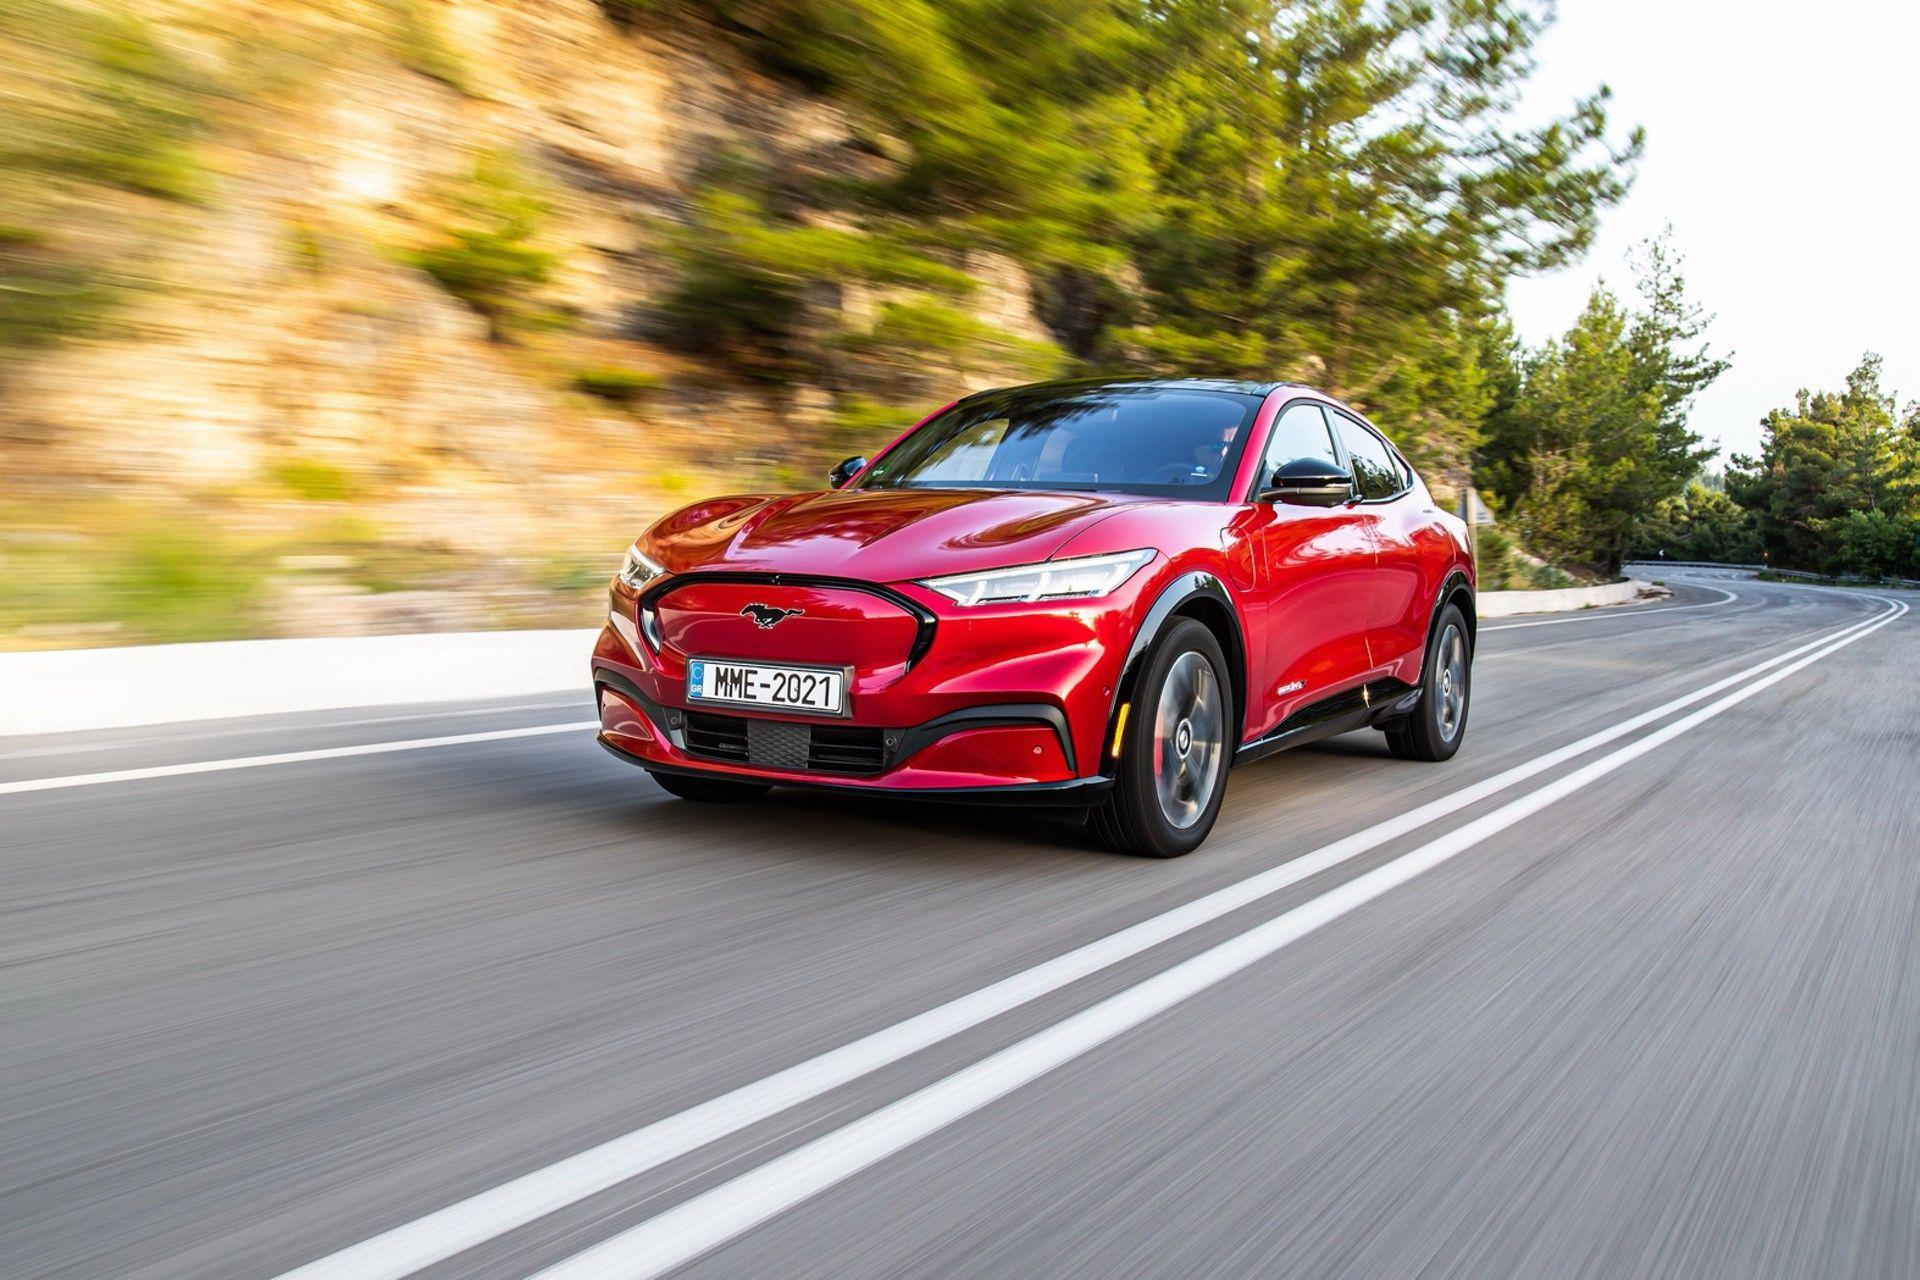 Ford_Mustang_Mach-E_greek_presskit-0072